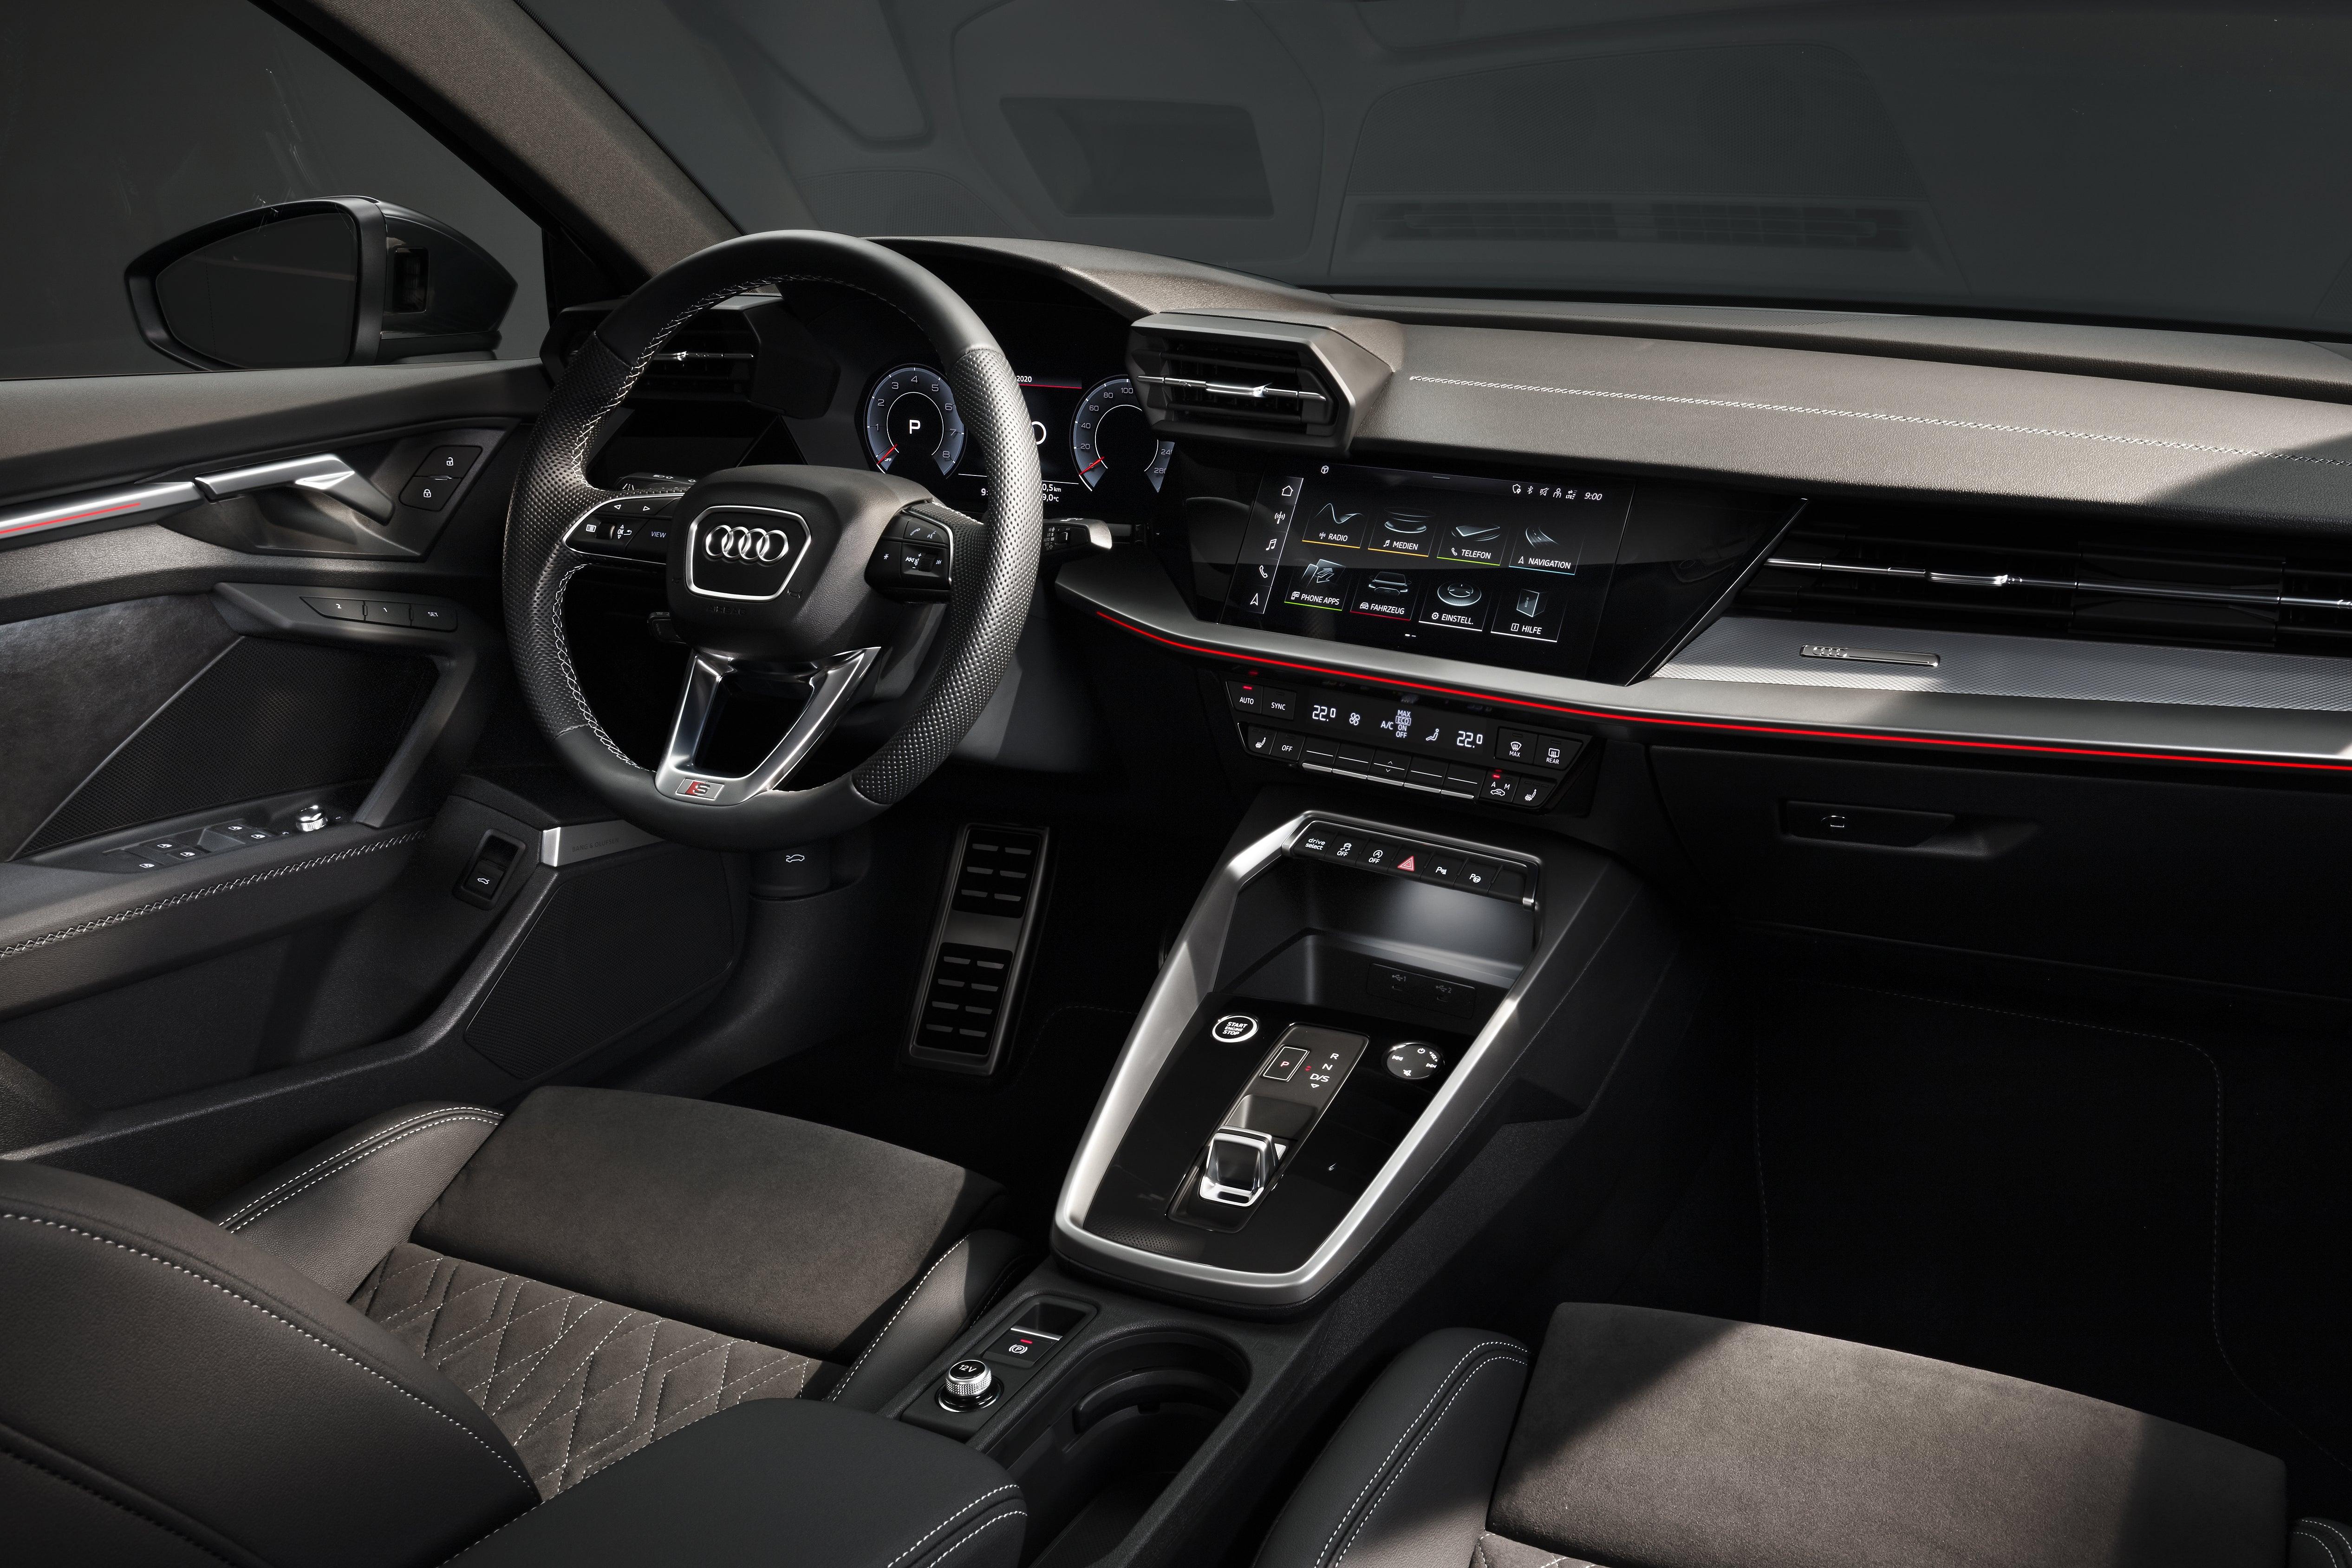 Audi A3 Saloon interior